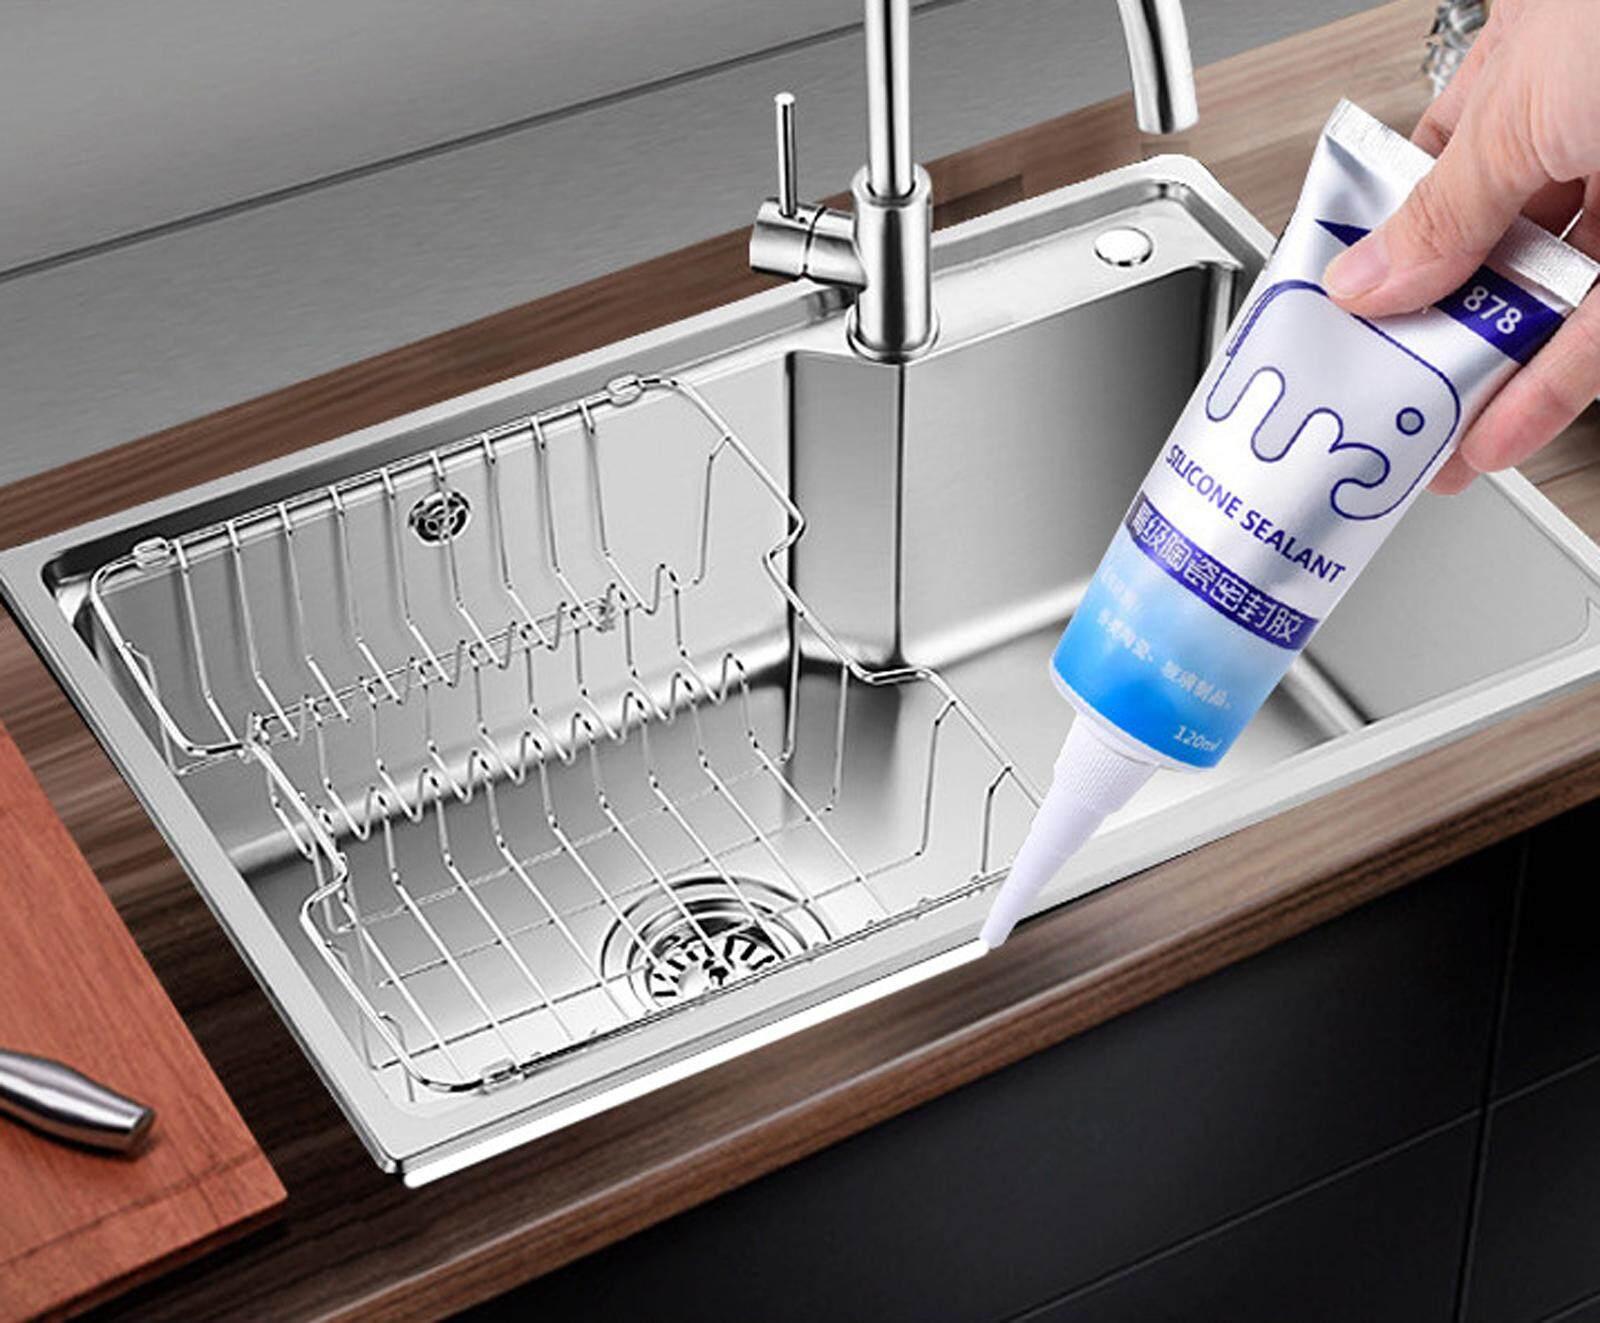 NaVa KS-878 DIY Multipurpose Waterproof Silicon Sealant for Kitchen Toilet Bathroom Tile Anti Mold Fungus Tool [120ml]